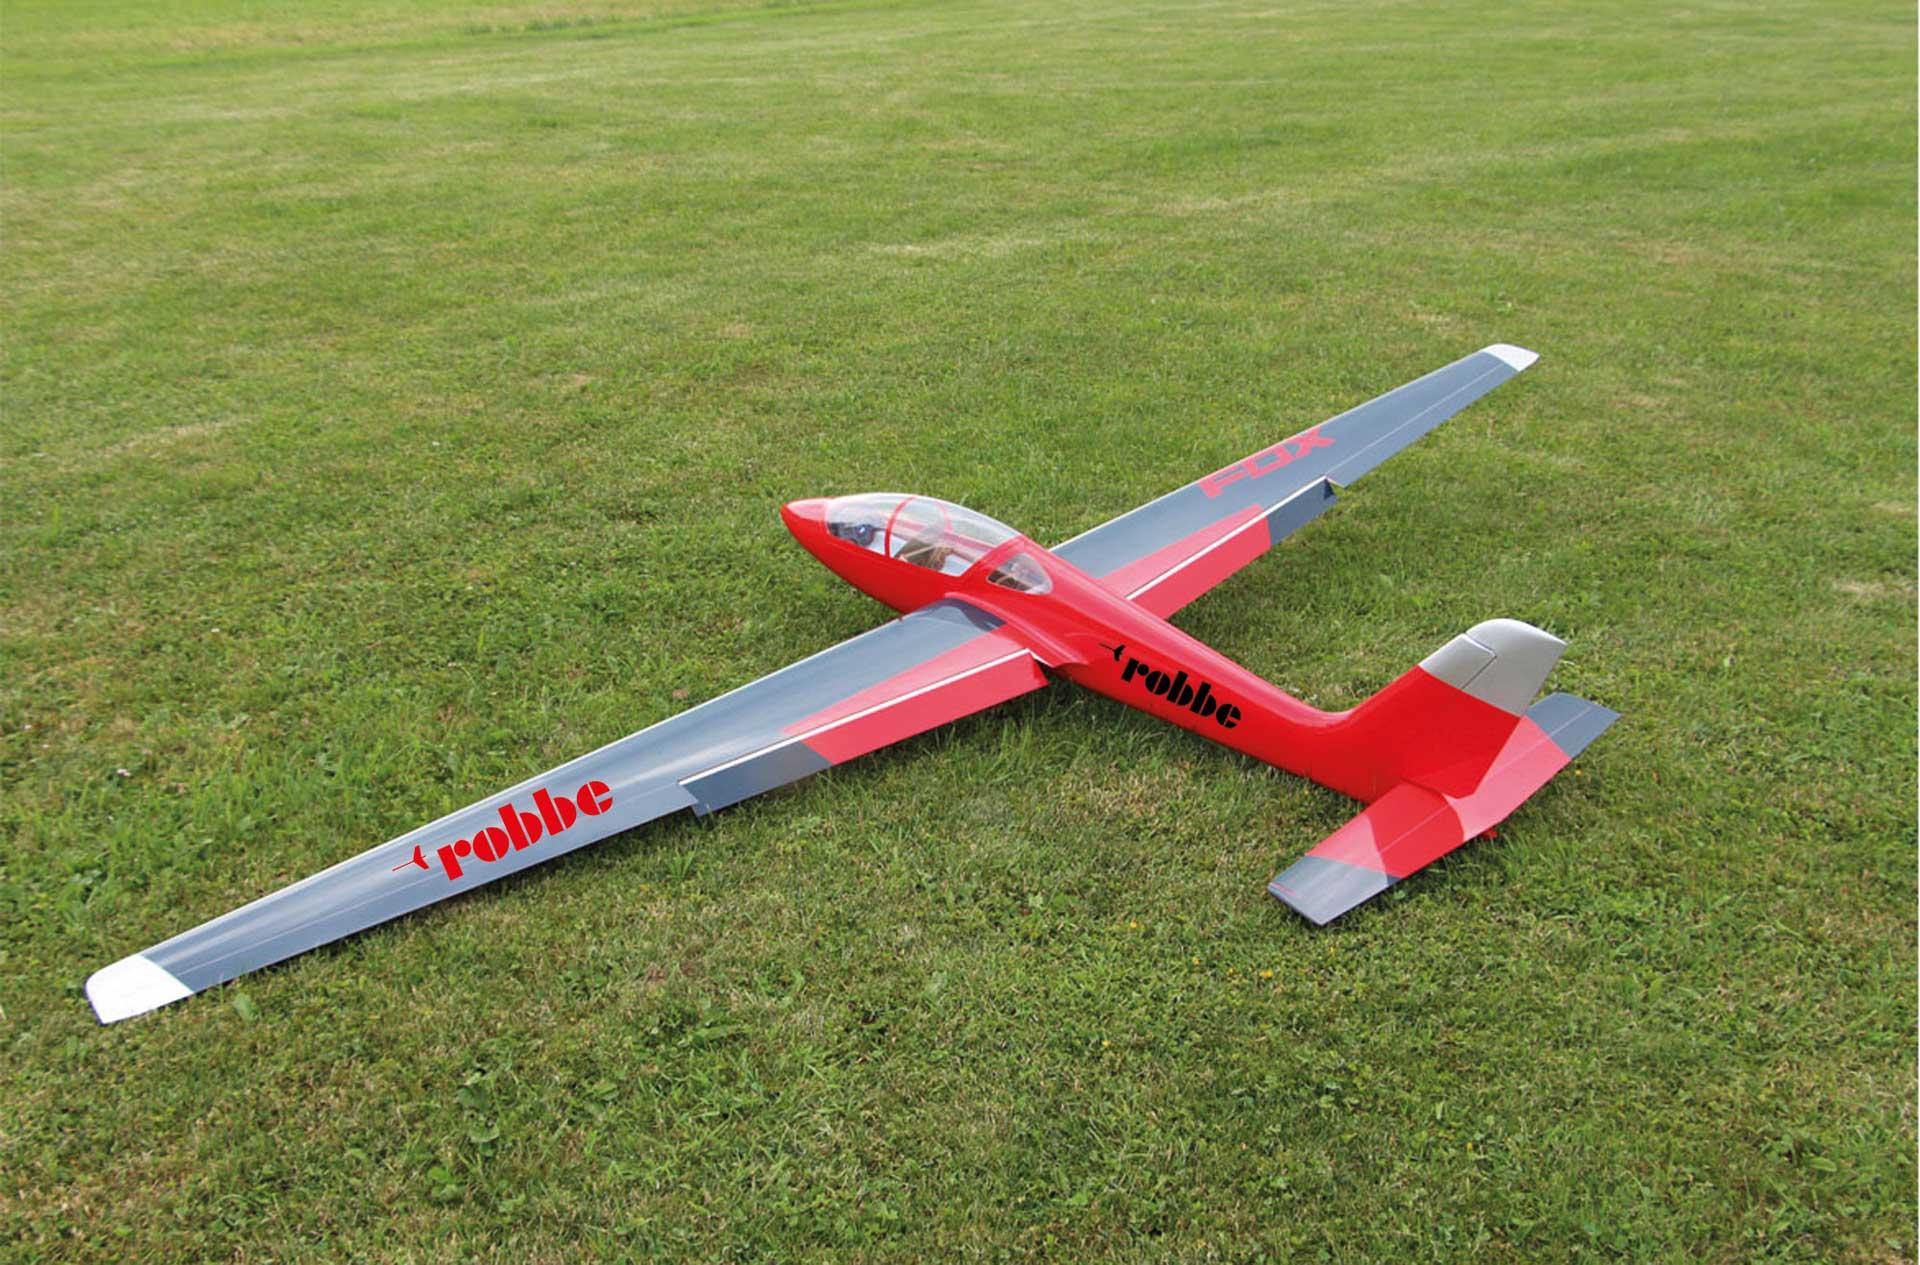 Robbe Modellsport MDM-1 Fox 3,5 m Segler ARF Voll GFK lackiert Kunstflug Segelflugzeug